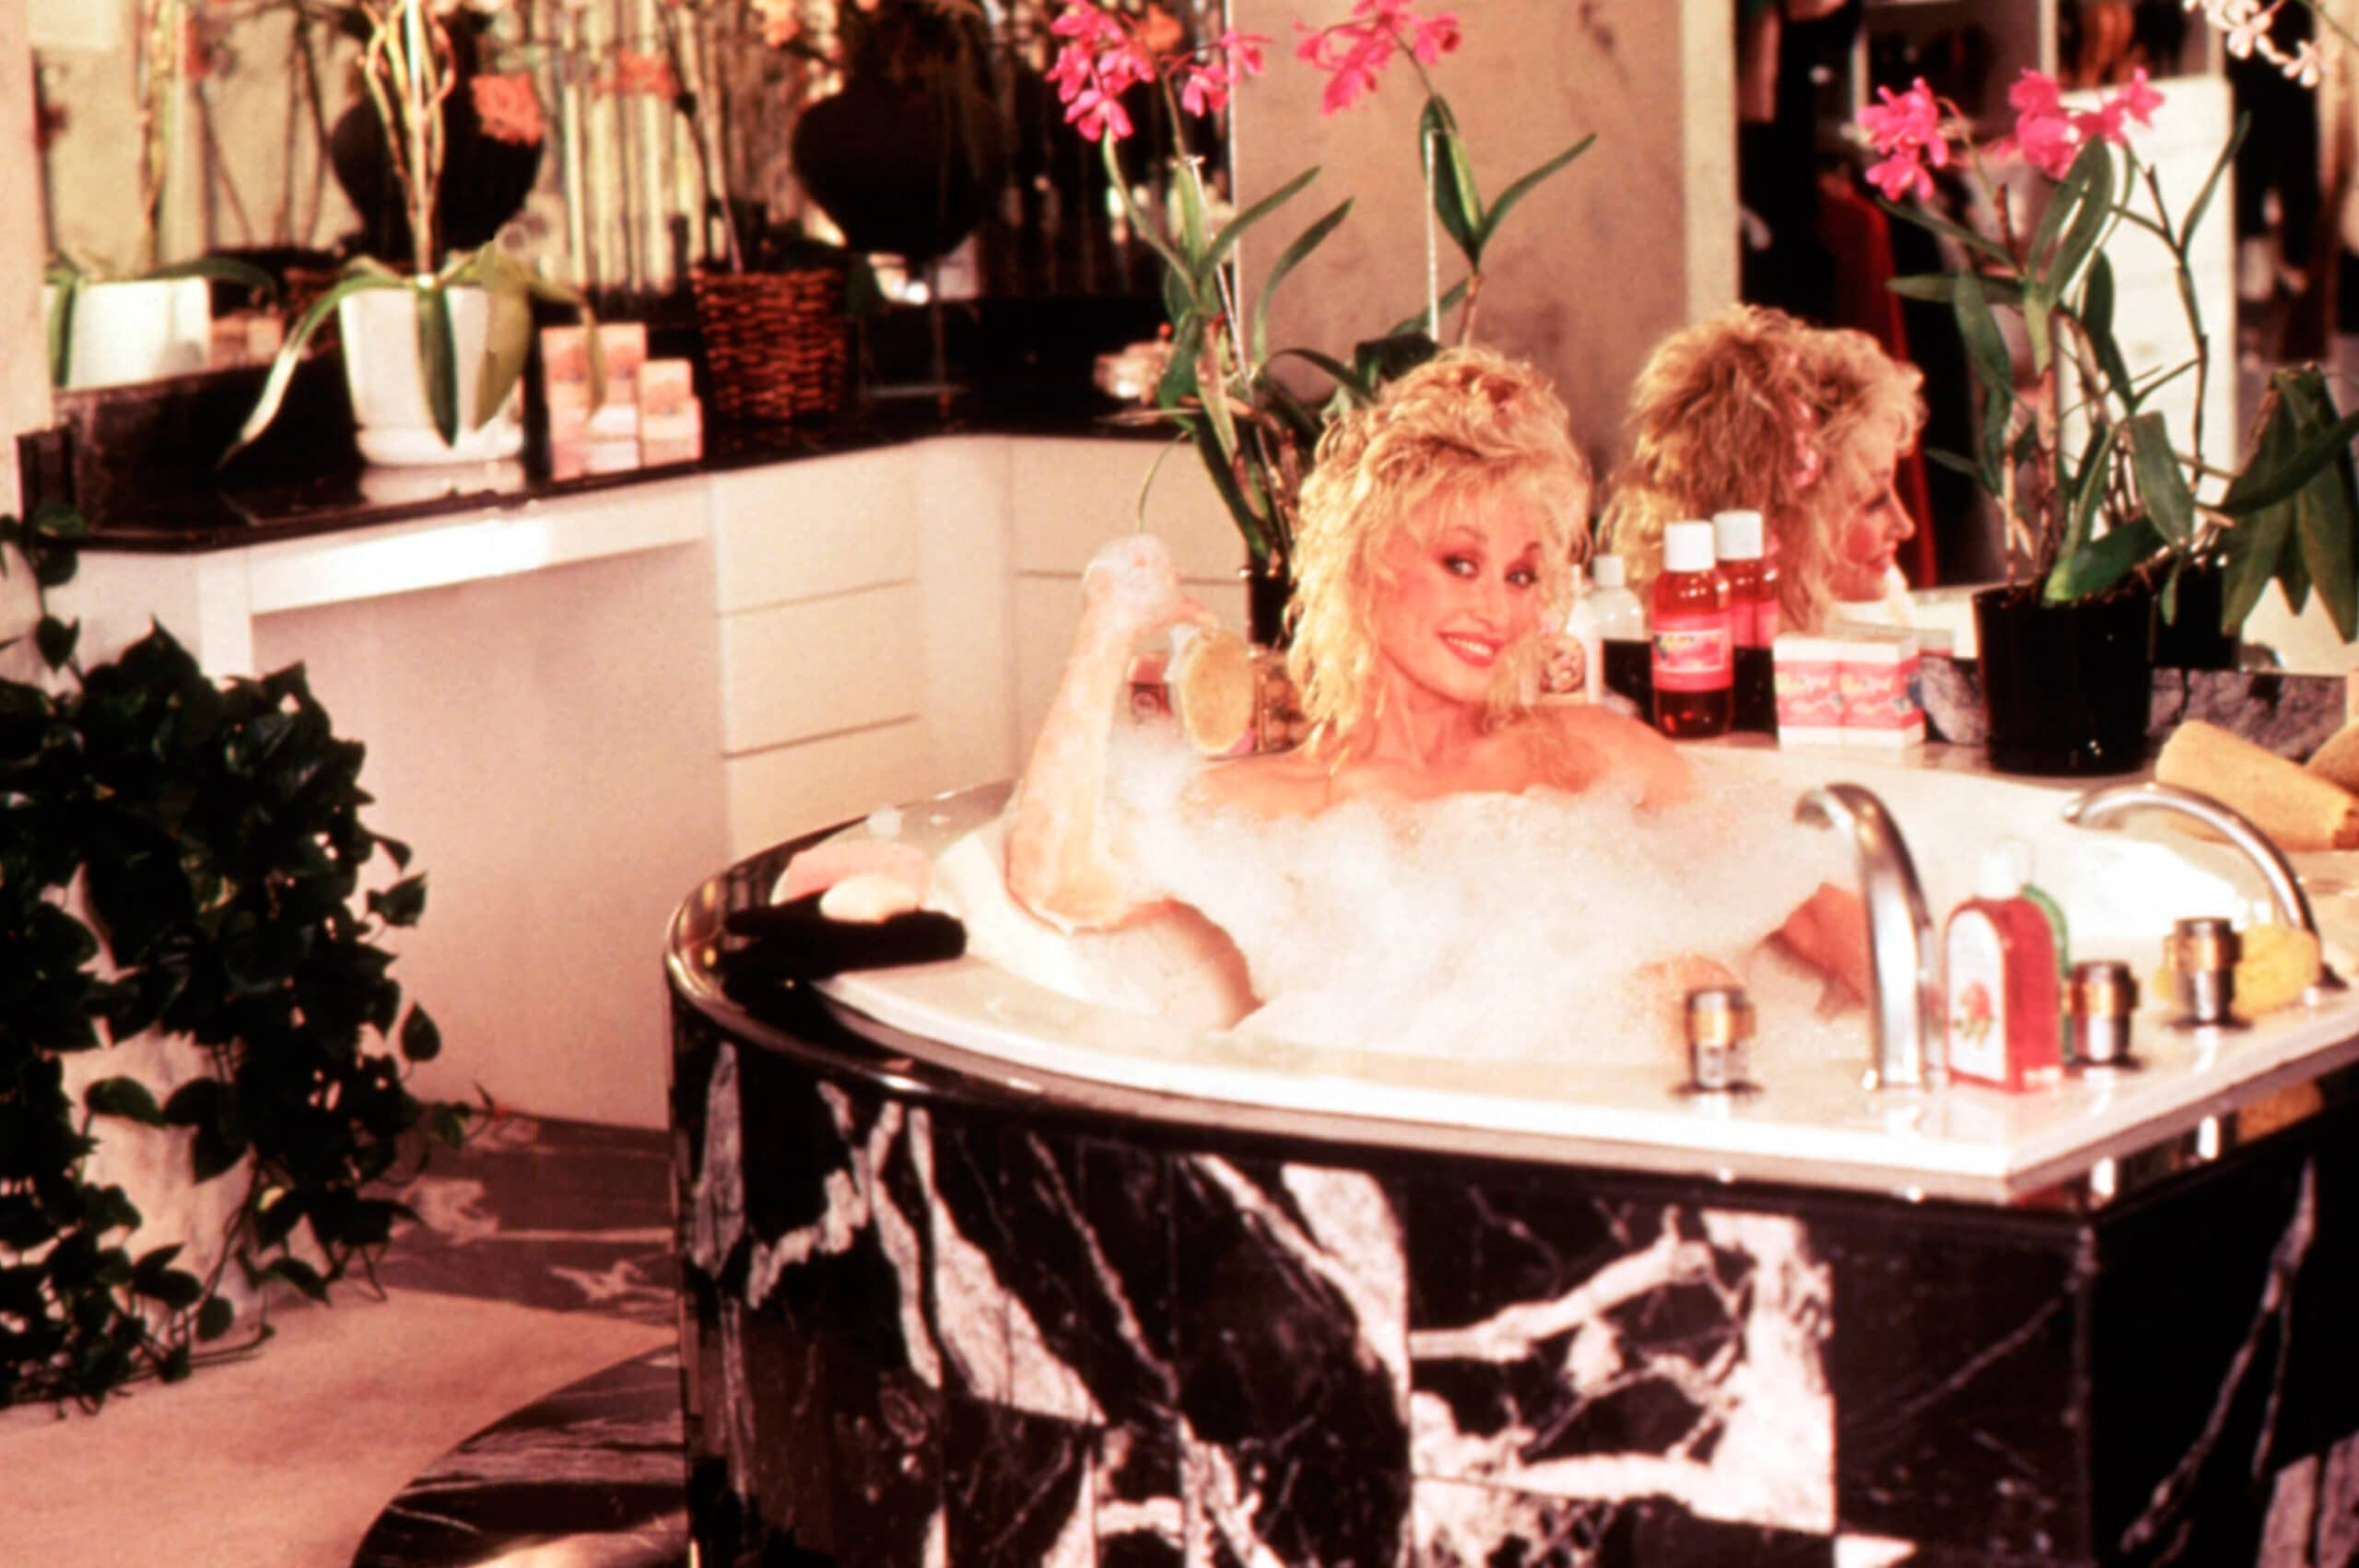 dolly parton in the bath